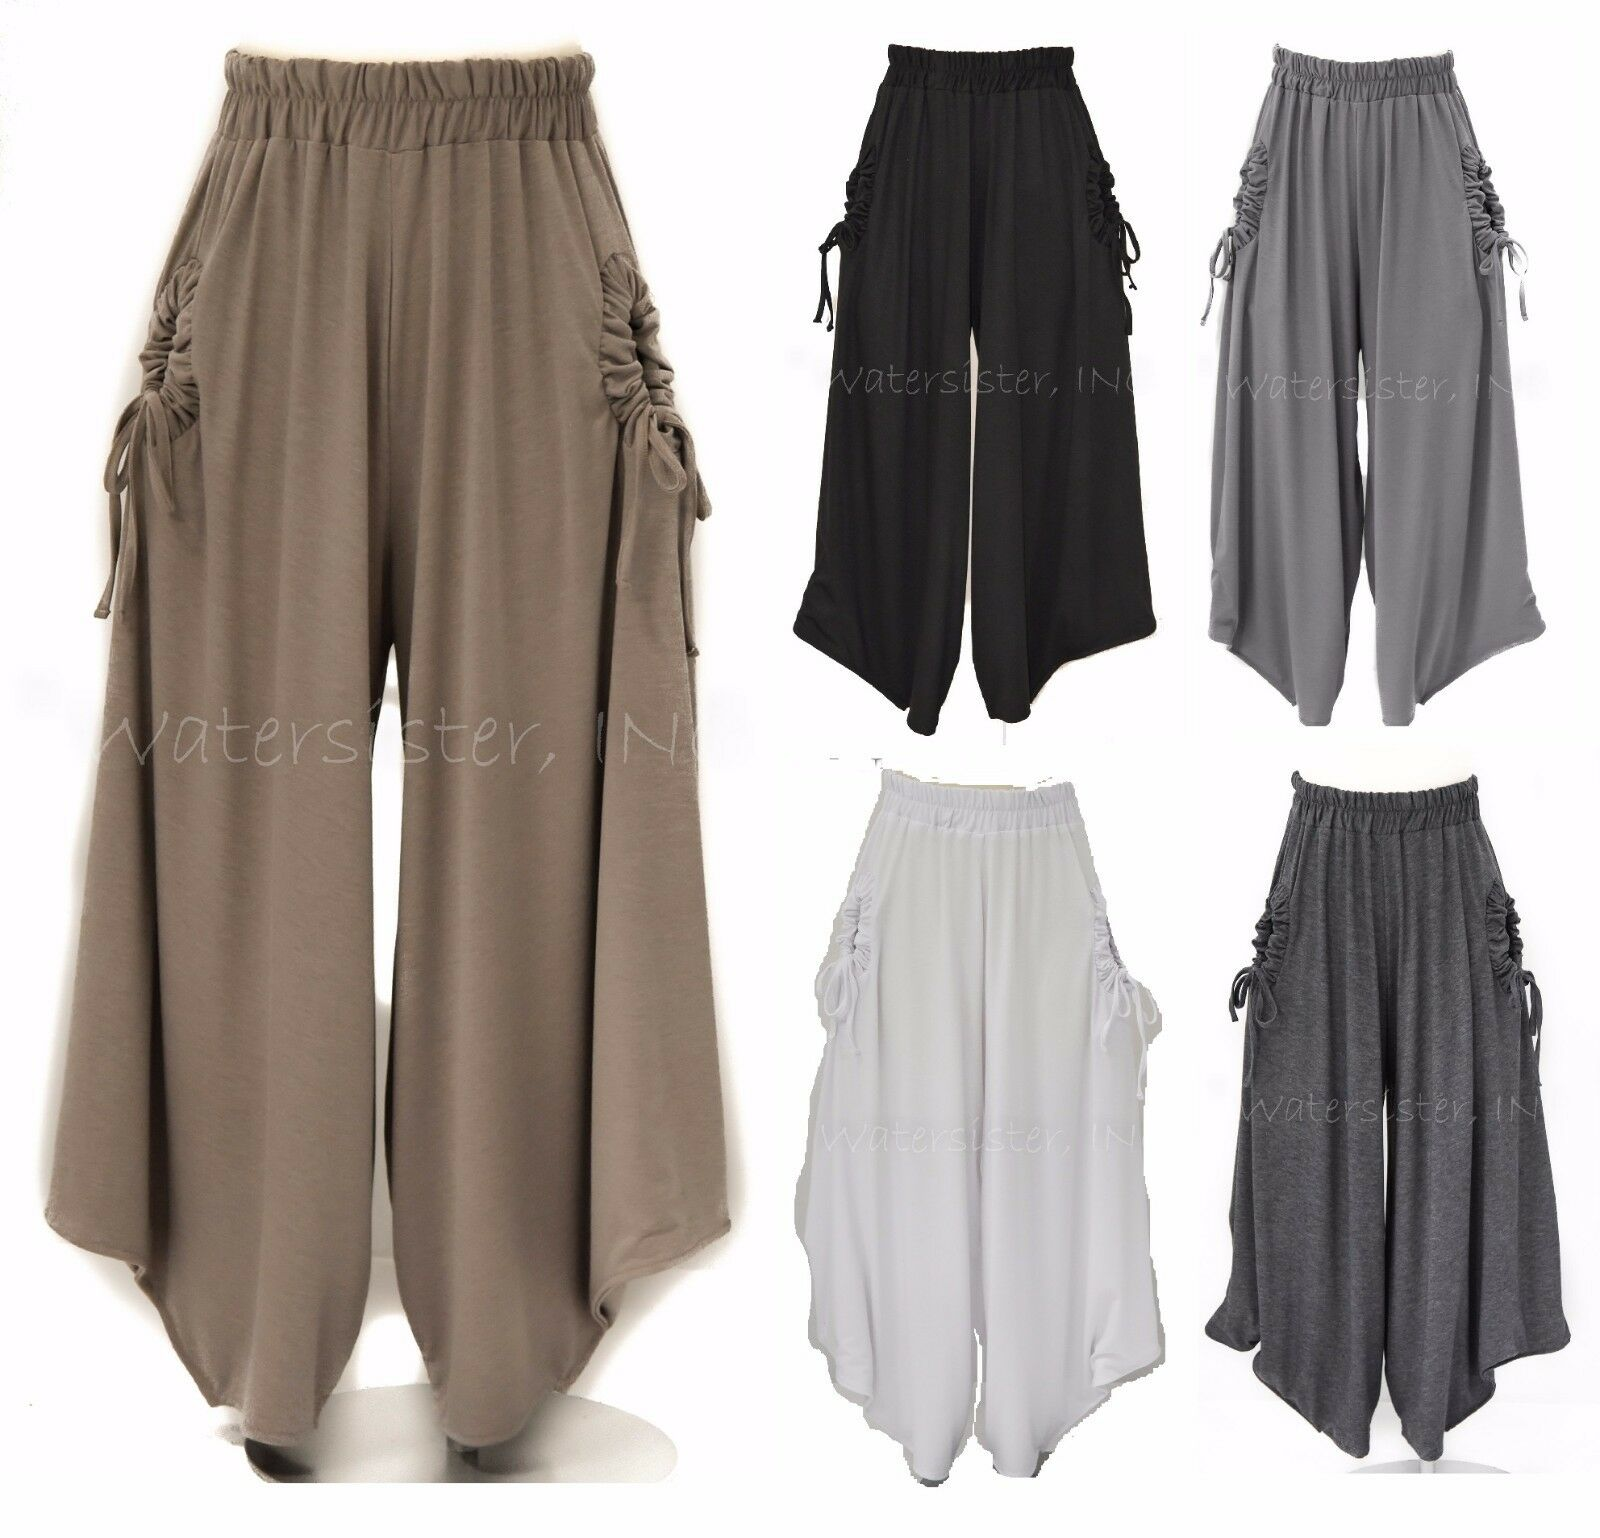 YEA Soft Jersey  KULA PANT Wide Leg Harem Hem Crop Pants PLUS  2X 3X  5 COLORS